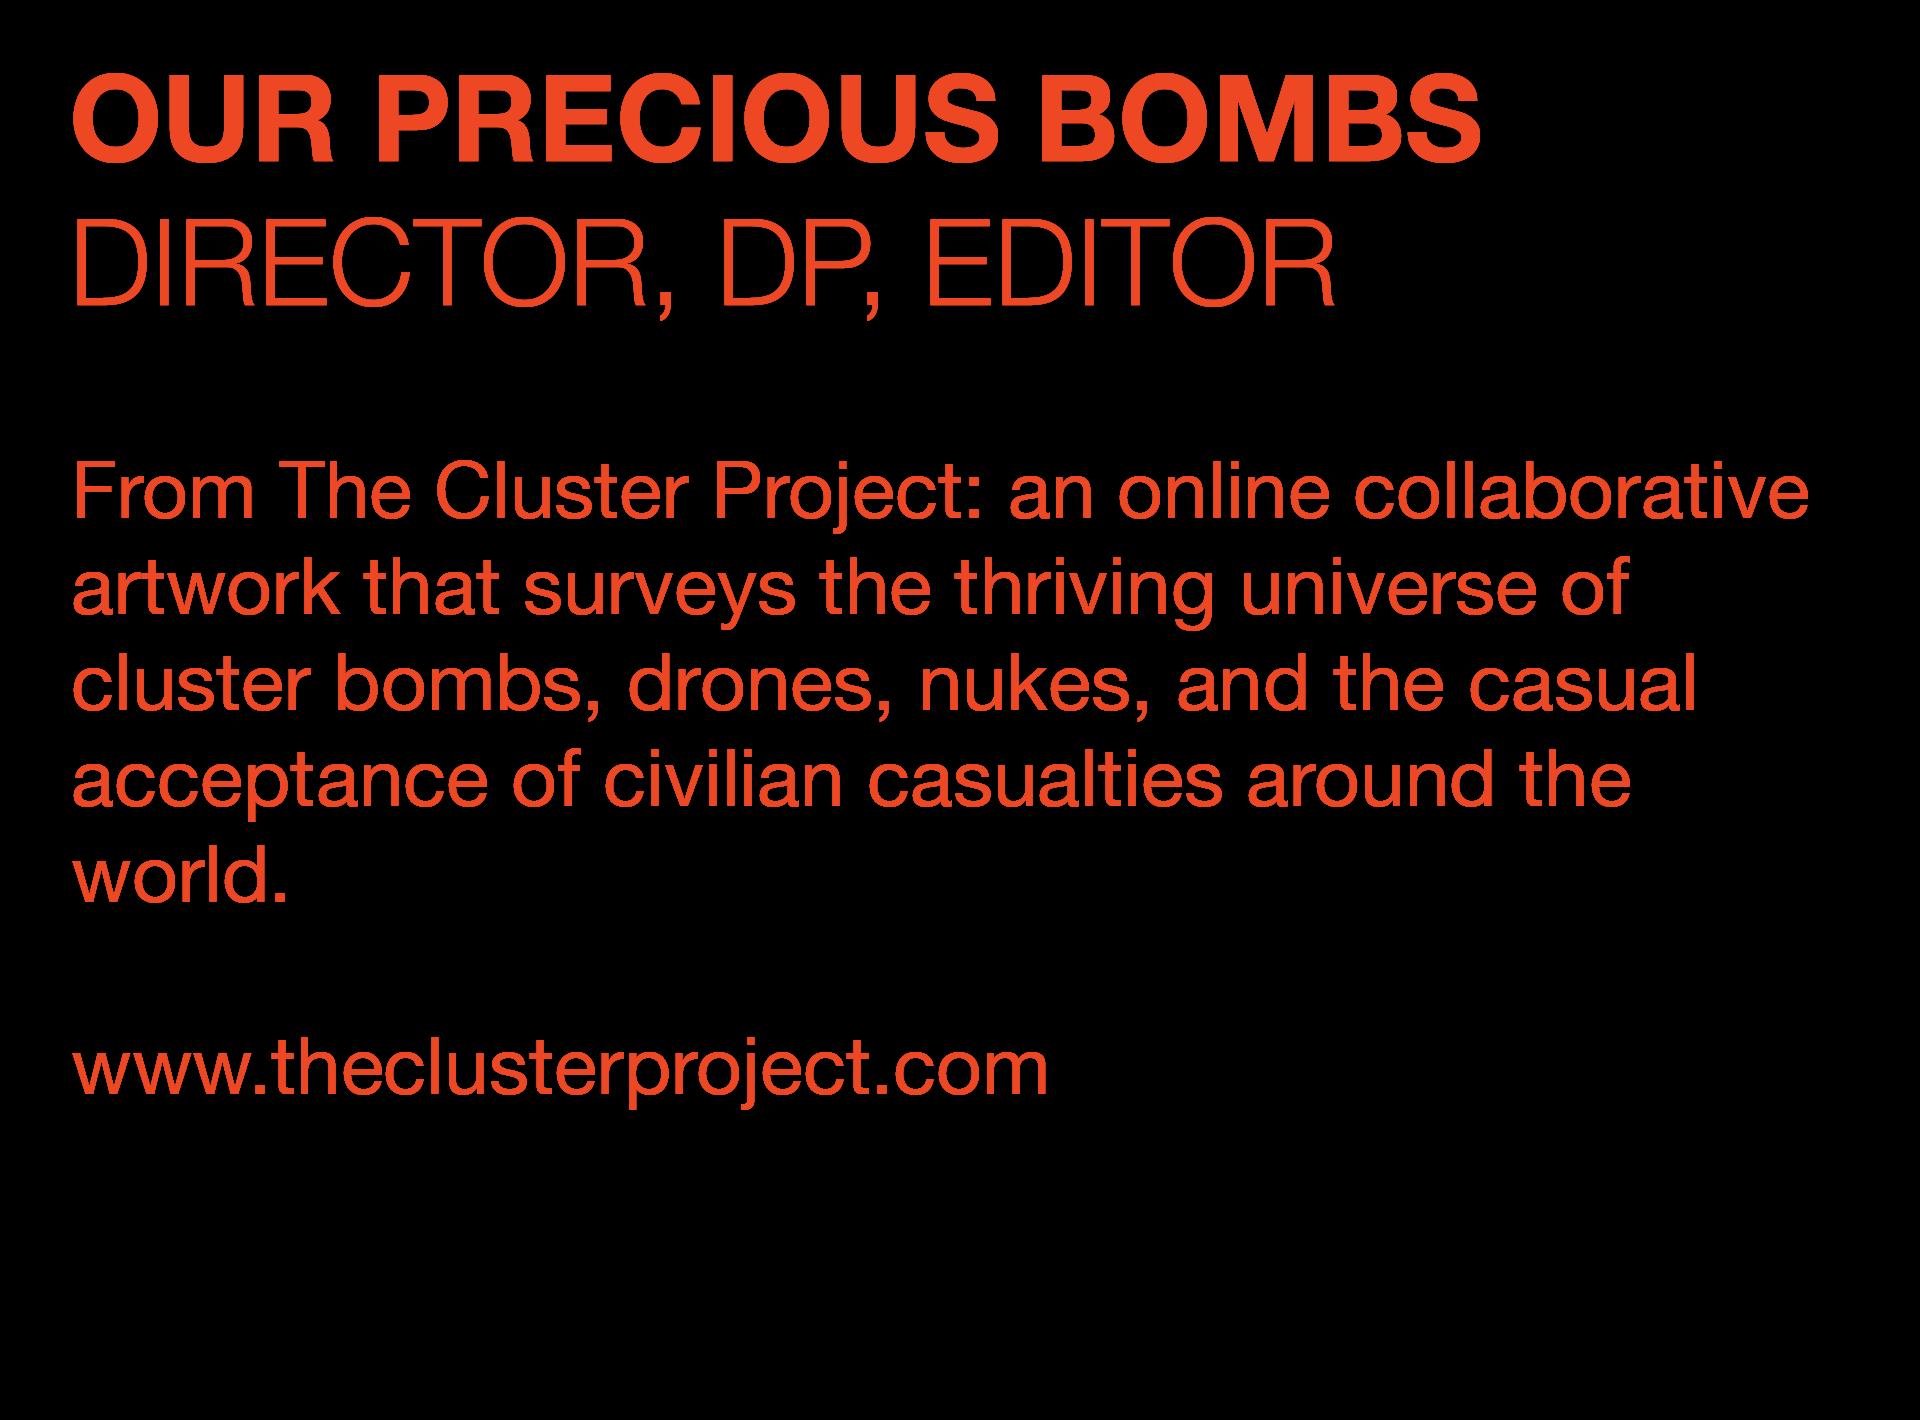 Our Precious Bombs Description.png